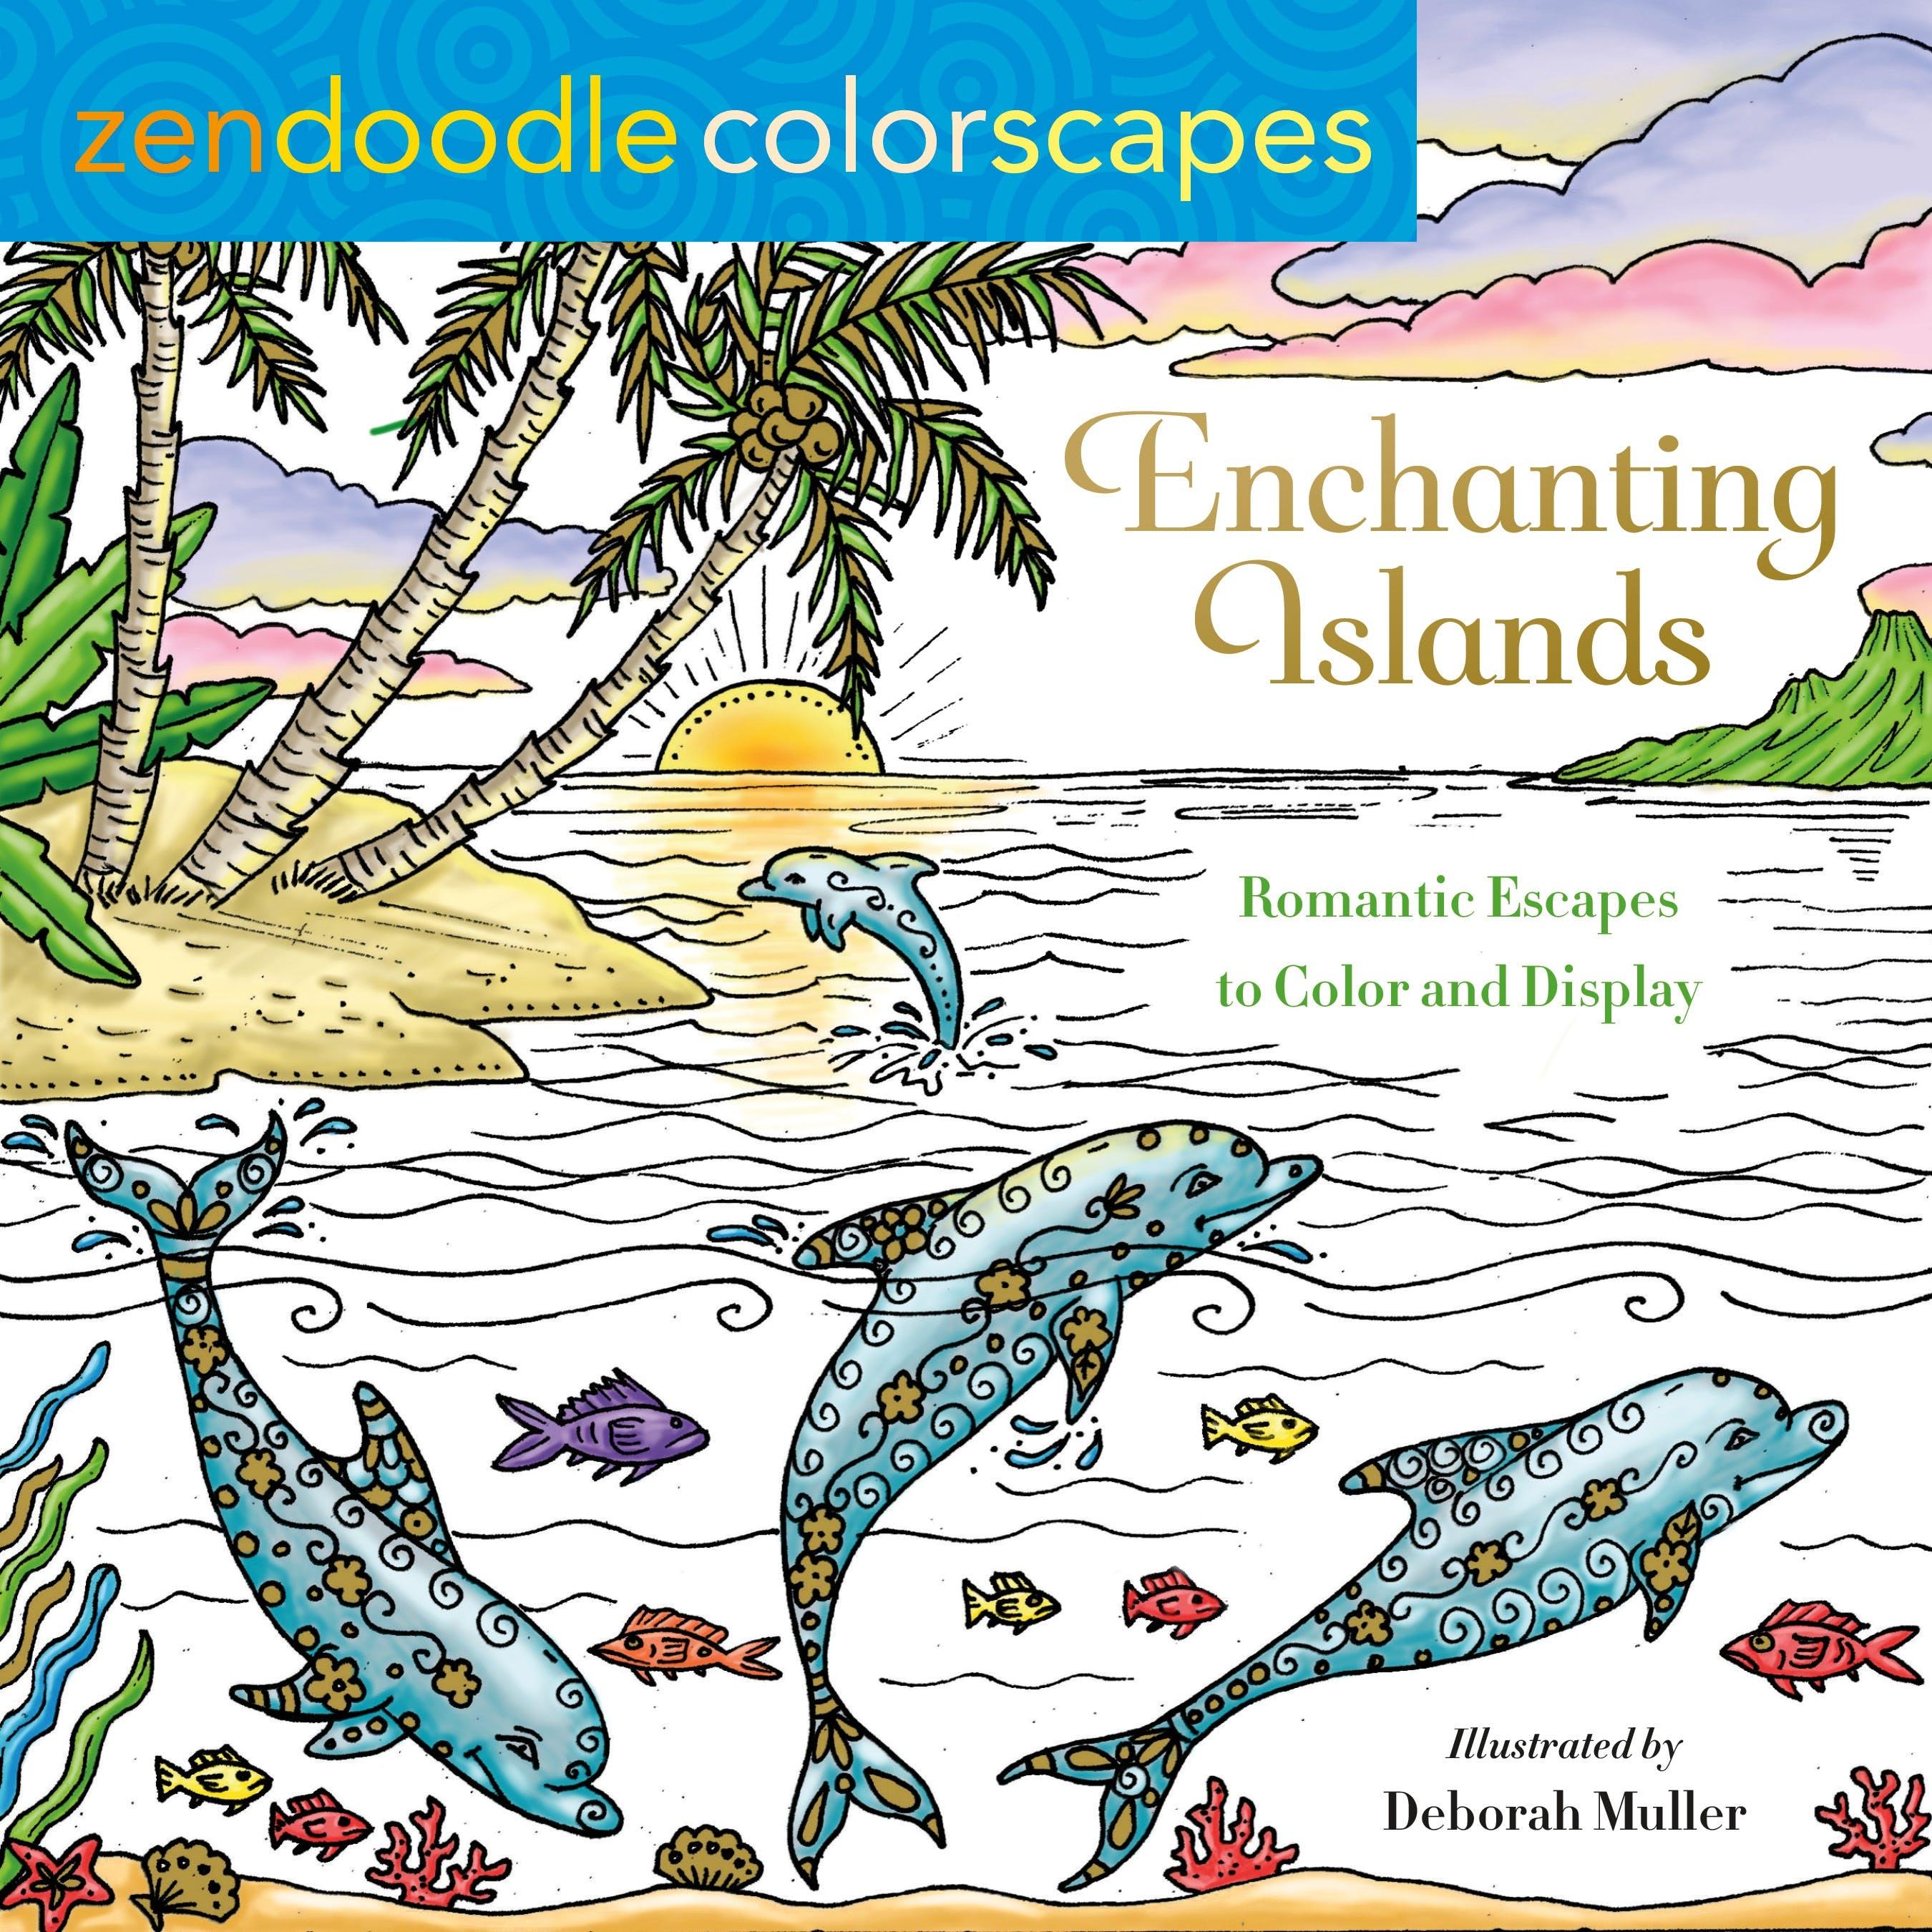 Image of Zendoodle Colorscapes: Enchanting Islands